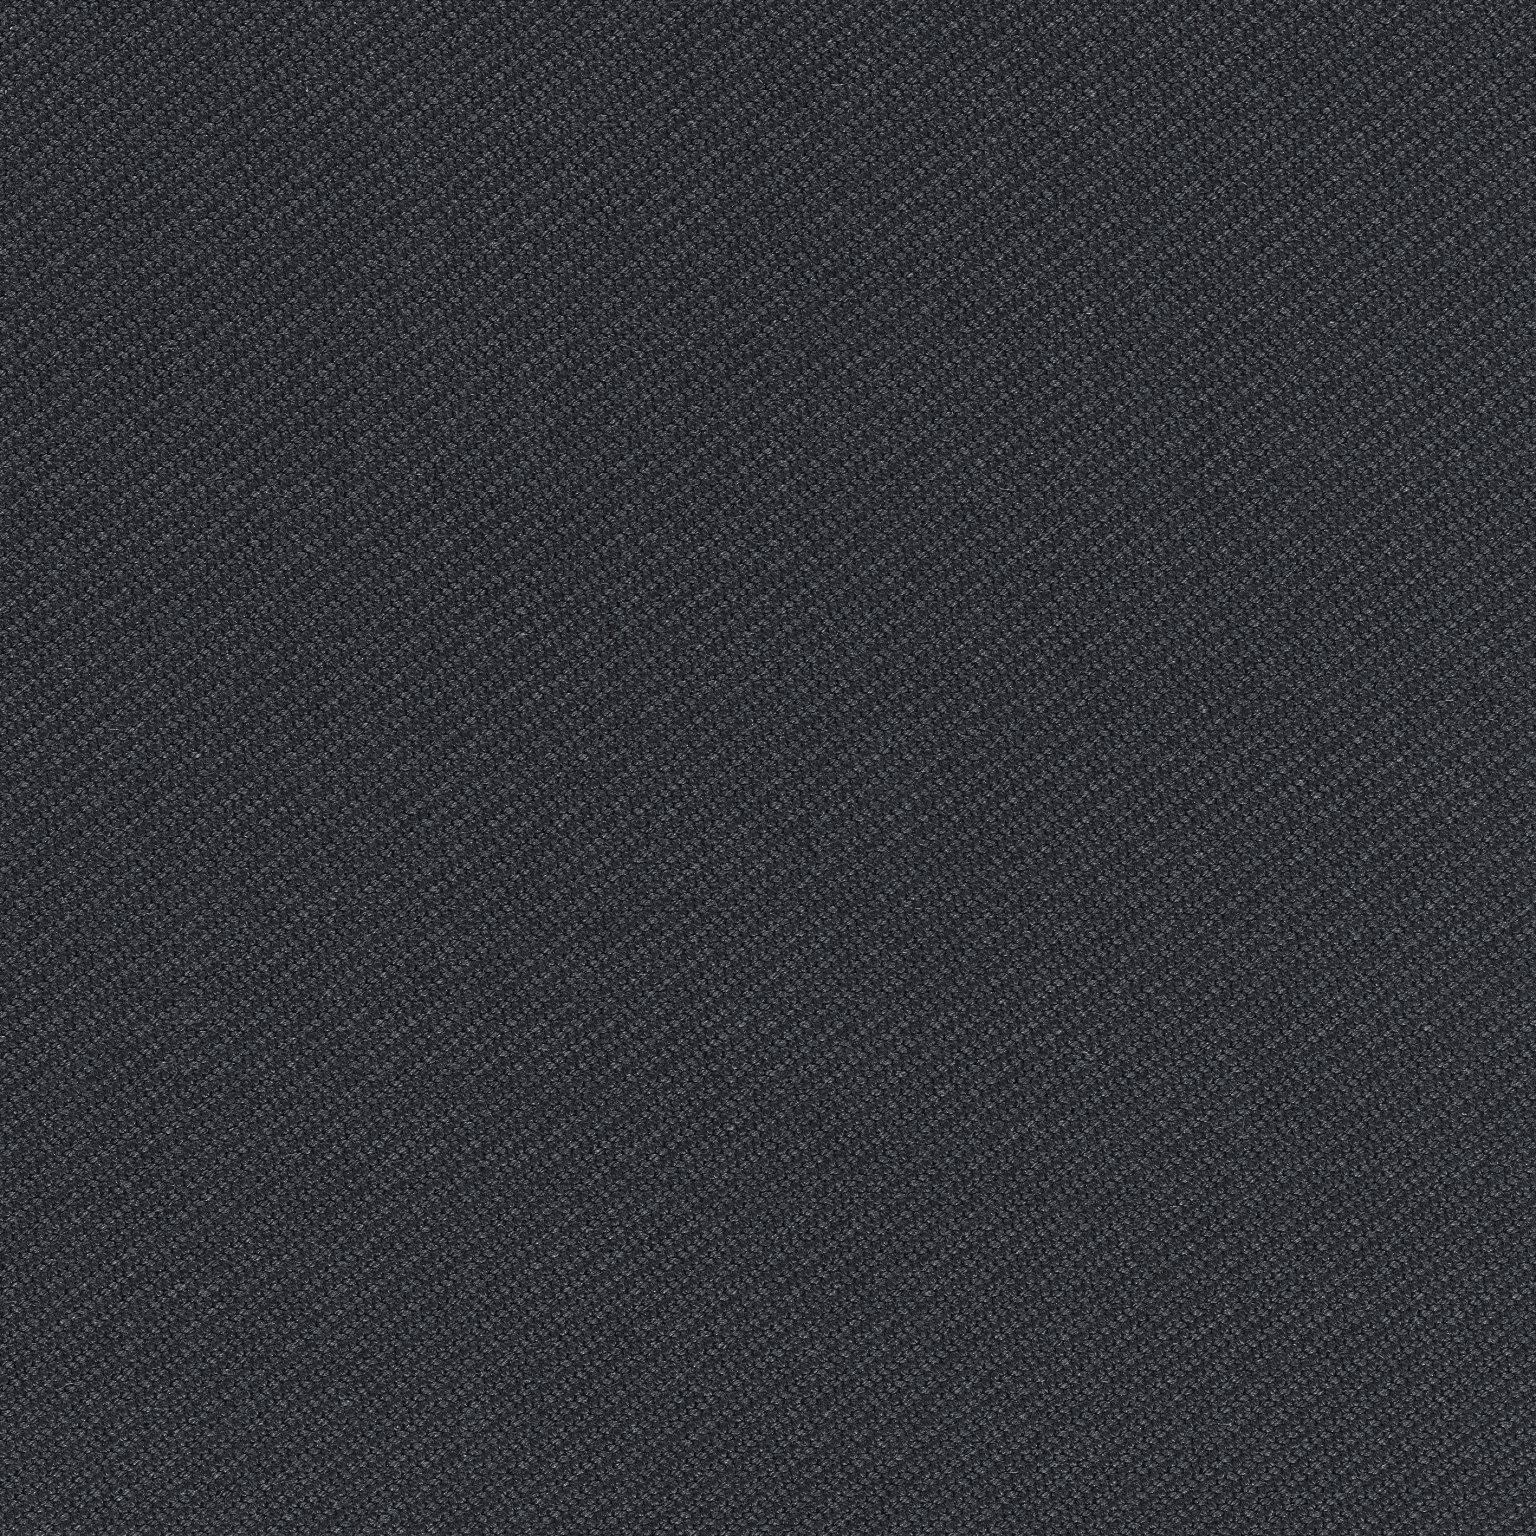 Kvadrat > Twill Weave 0190